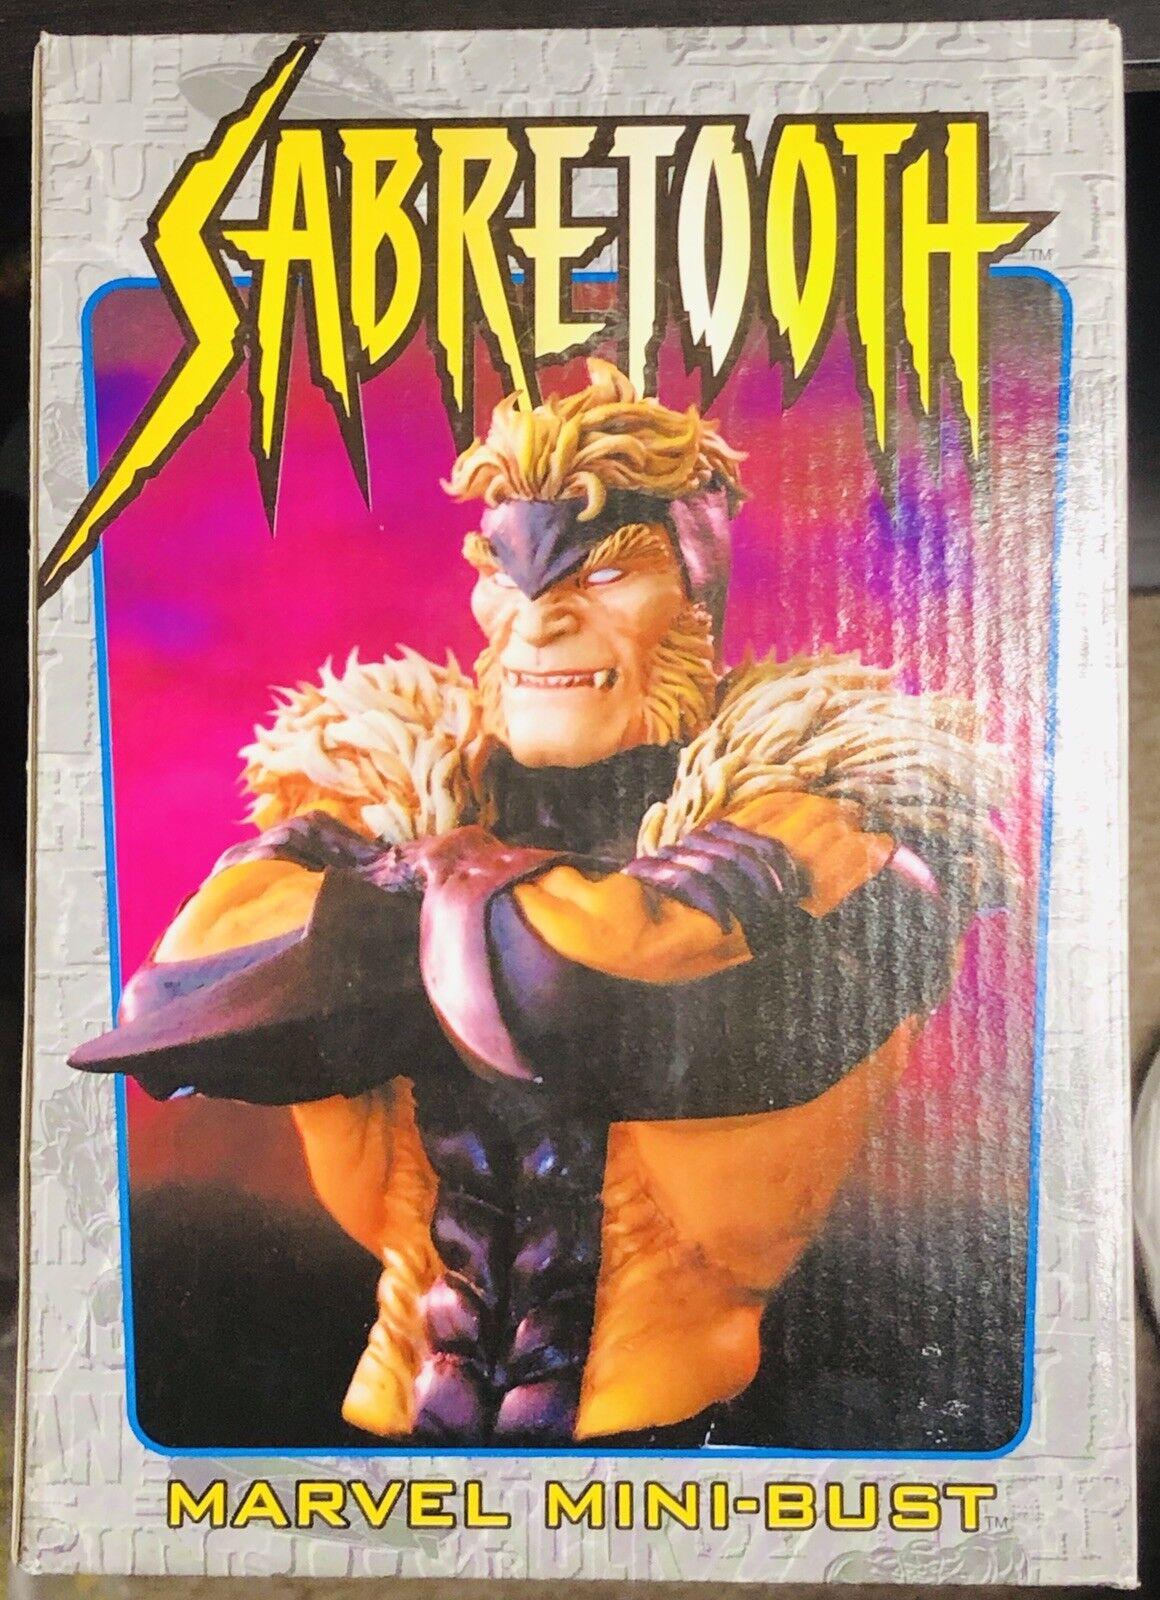 Marvel Sabretooth Signature Edition Bowen mini bust statue, Very Rare